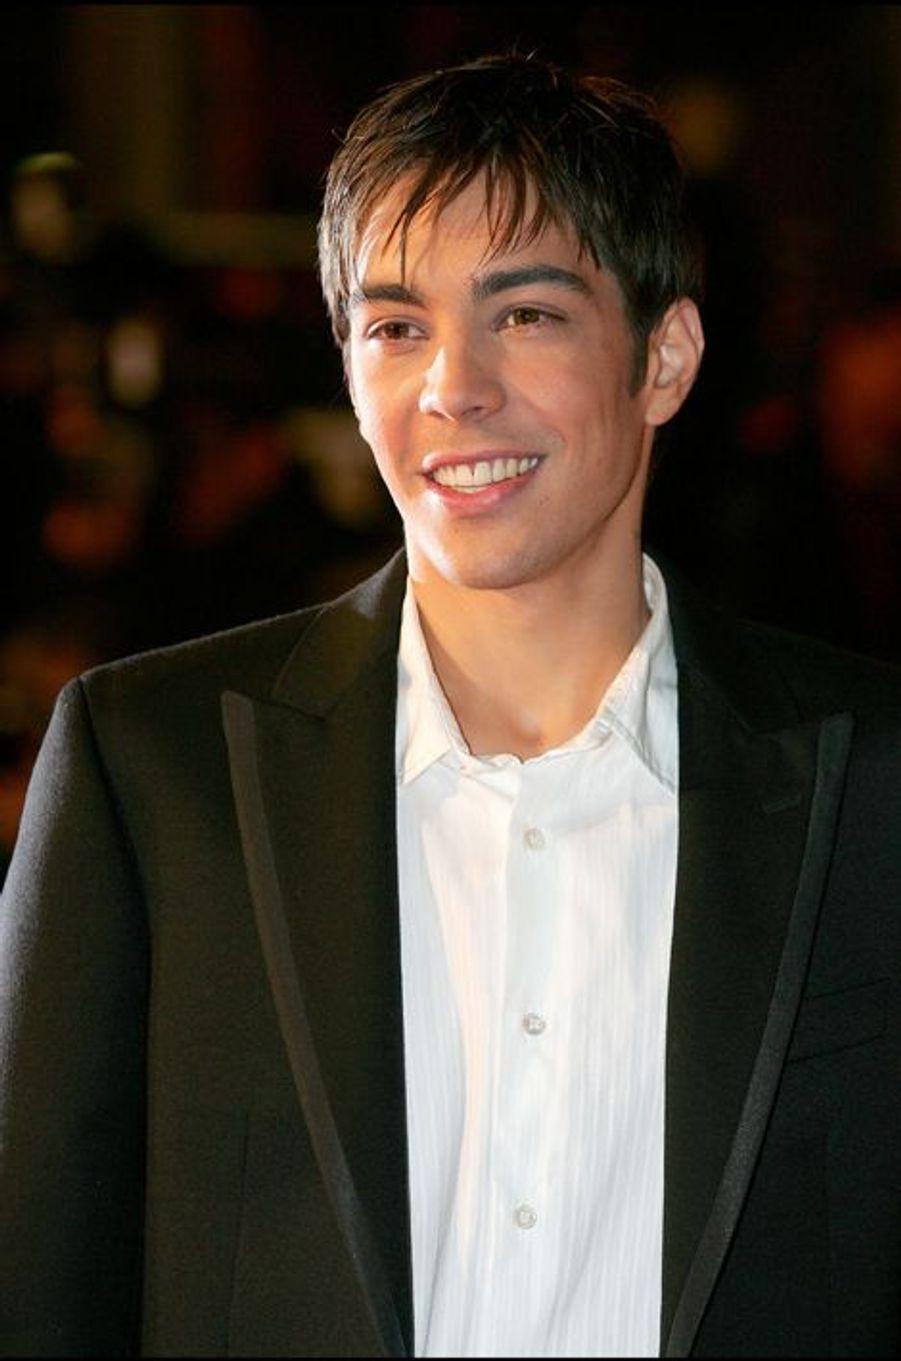 Grégory Lemarchal aux NRJ Music Awards 2005